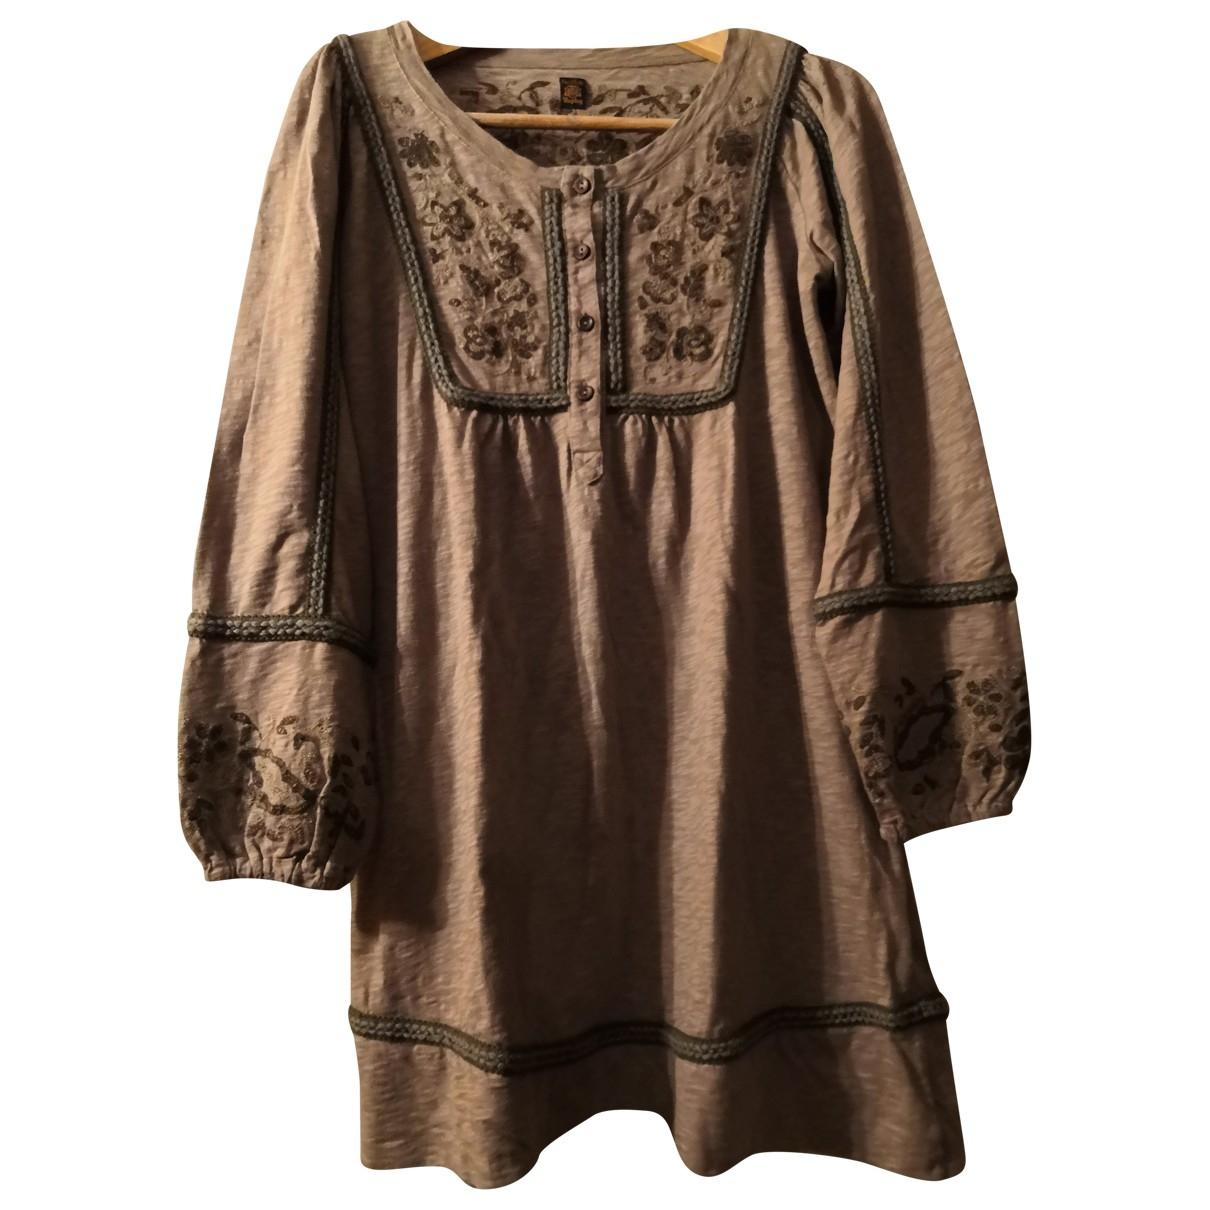 Replay \N Camel Cotton dress for Women S International